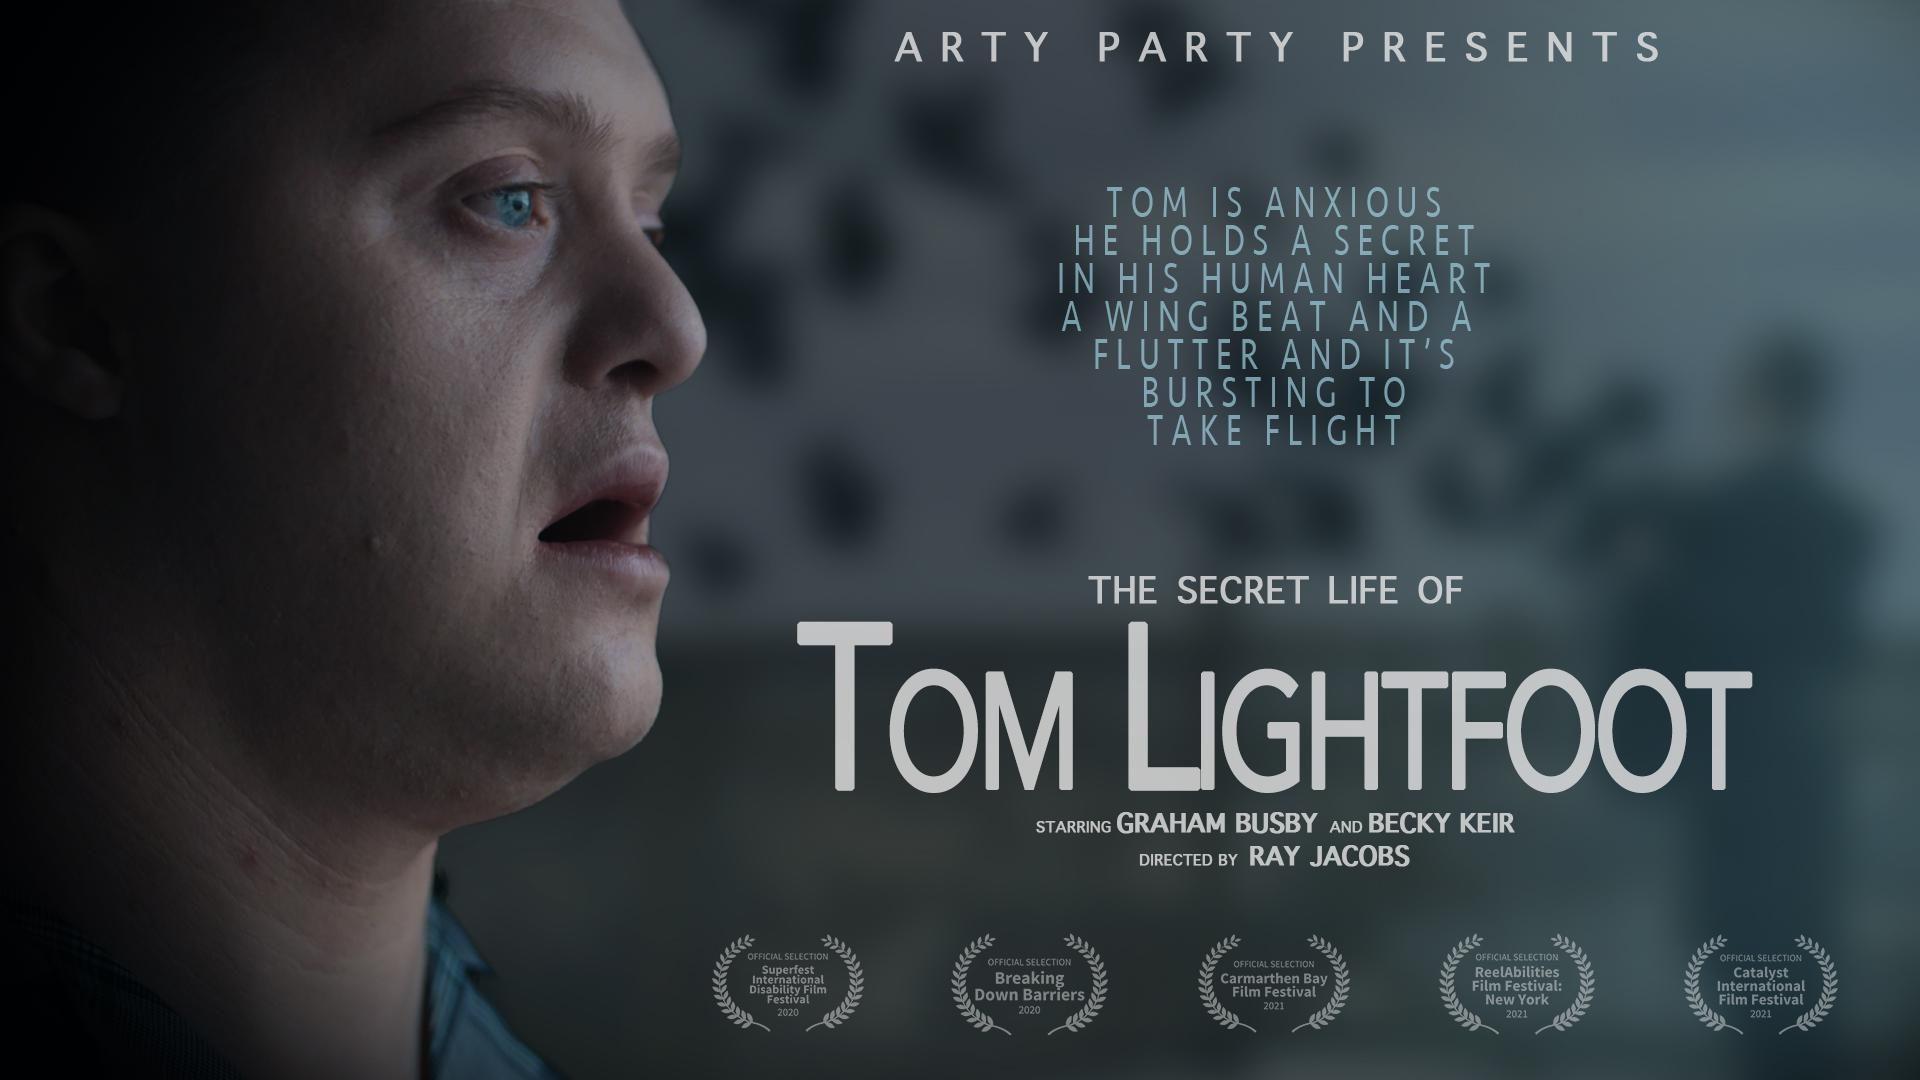 The Secret Life of Tom Lightfoot